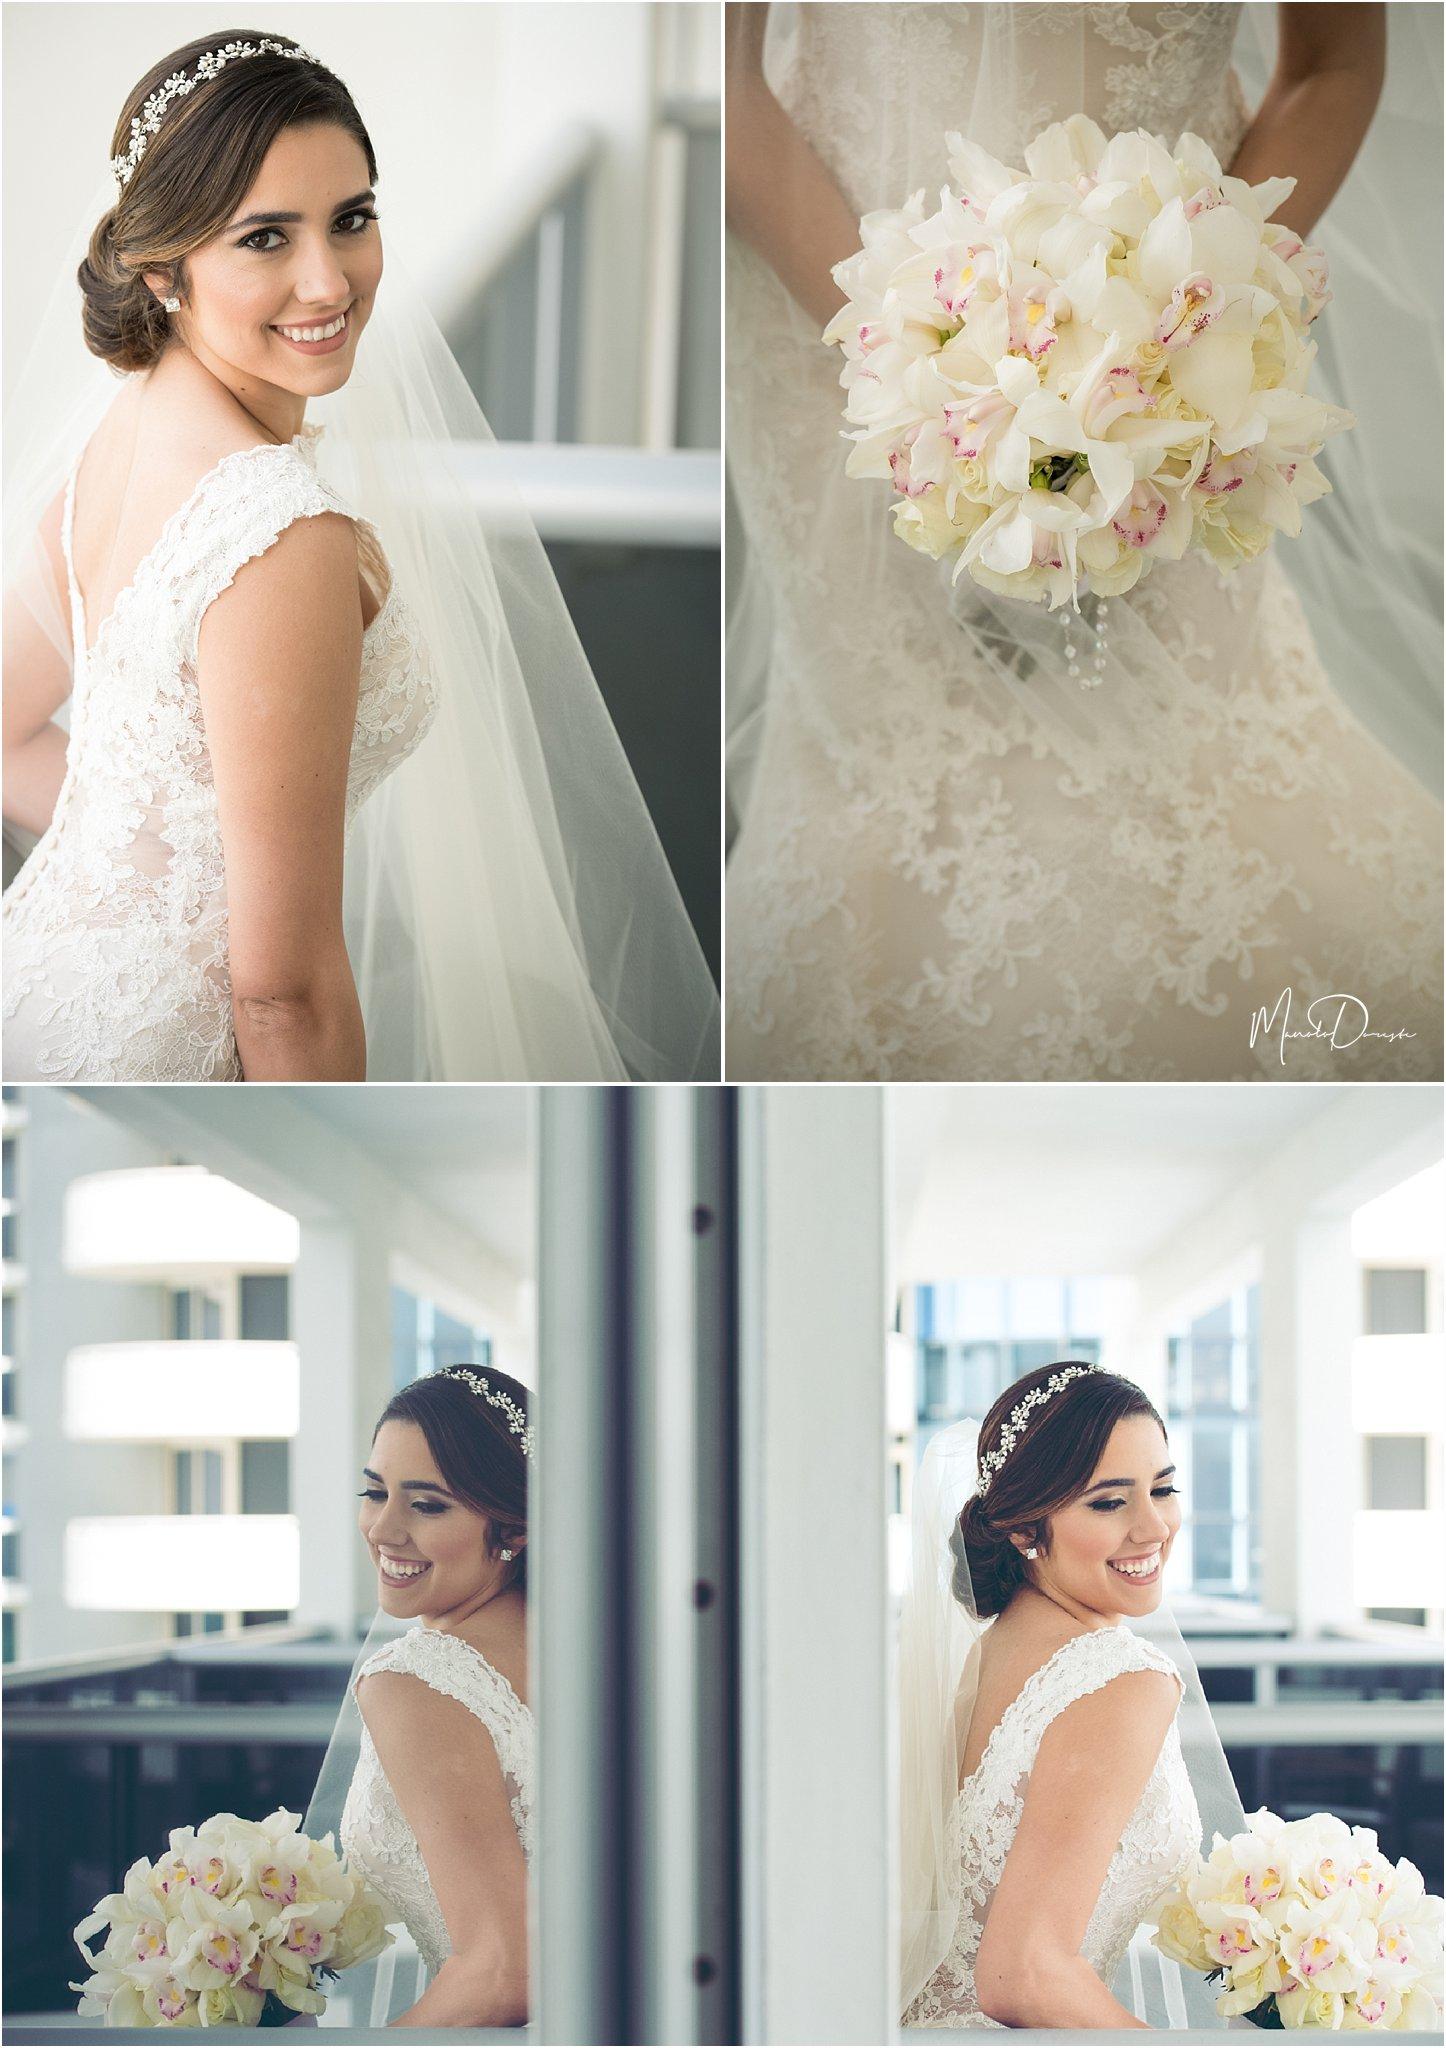 00931_ManoloDoreste_InFocusStudios_Wedding_Family_Photography_Miami_MiamiPhotographer.jpg